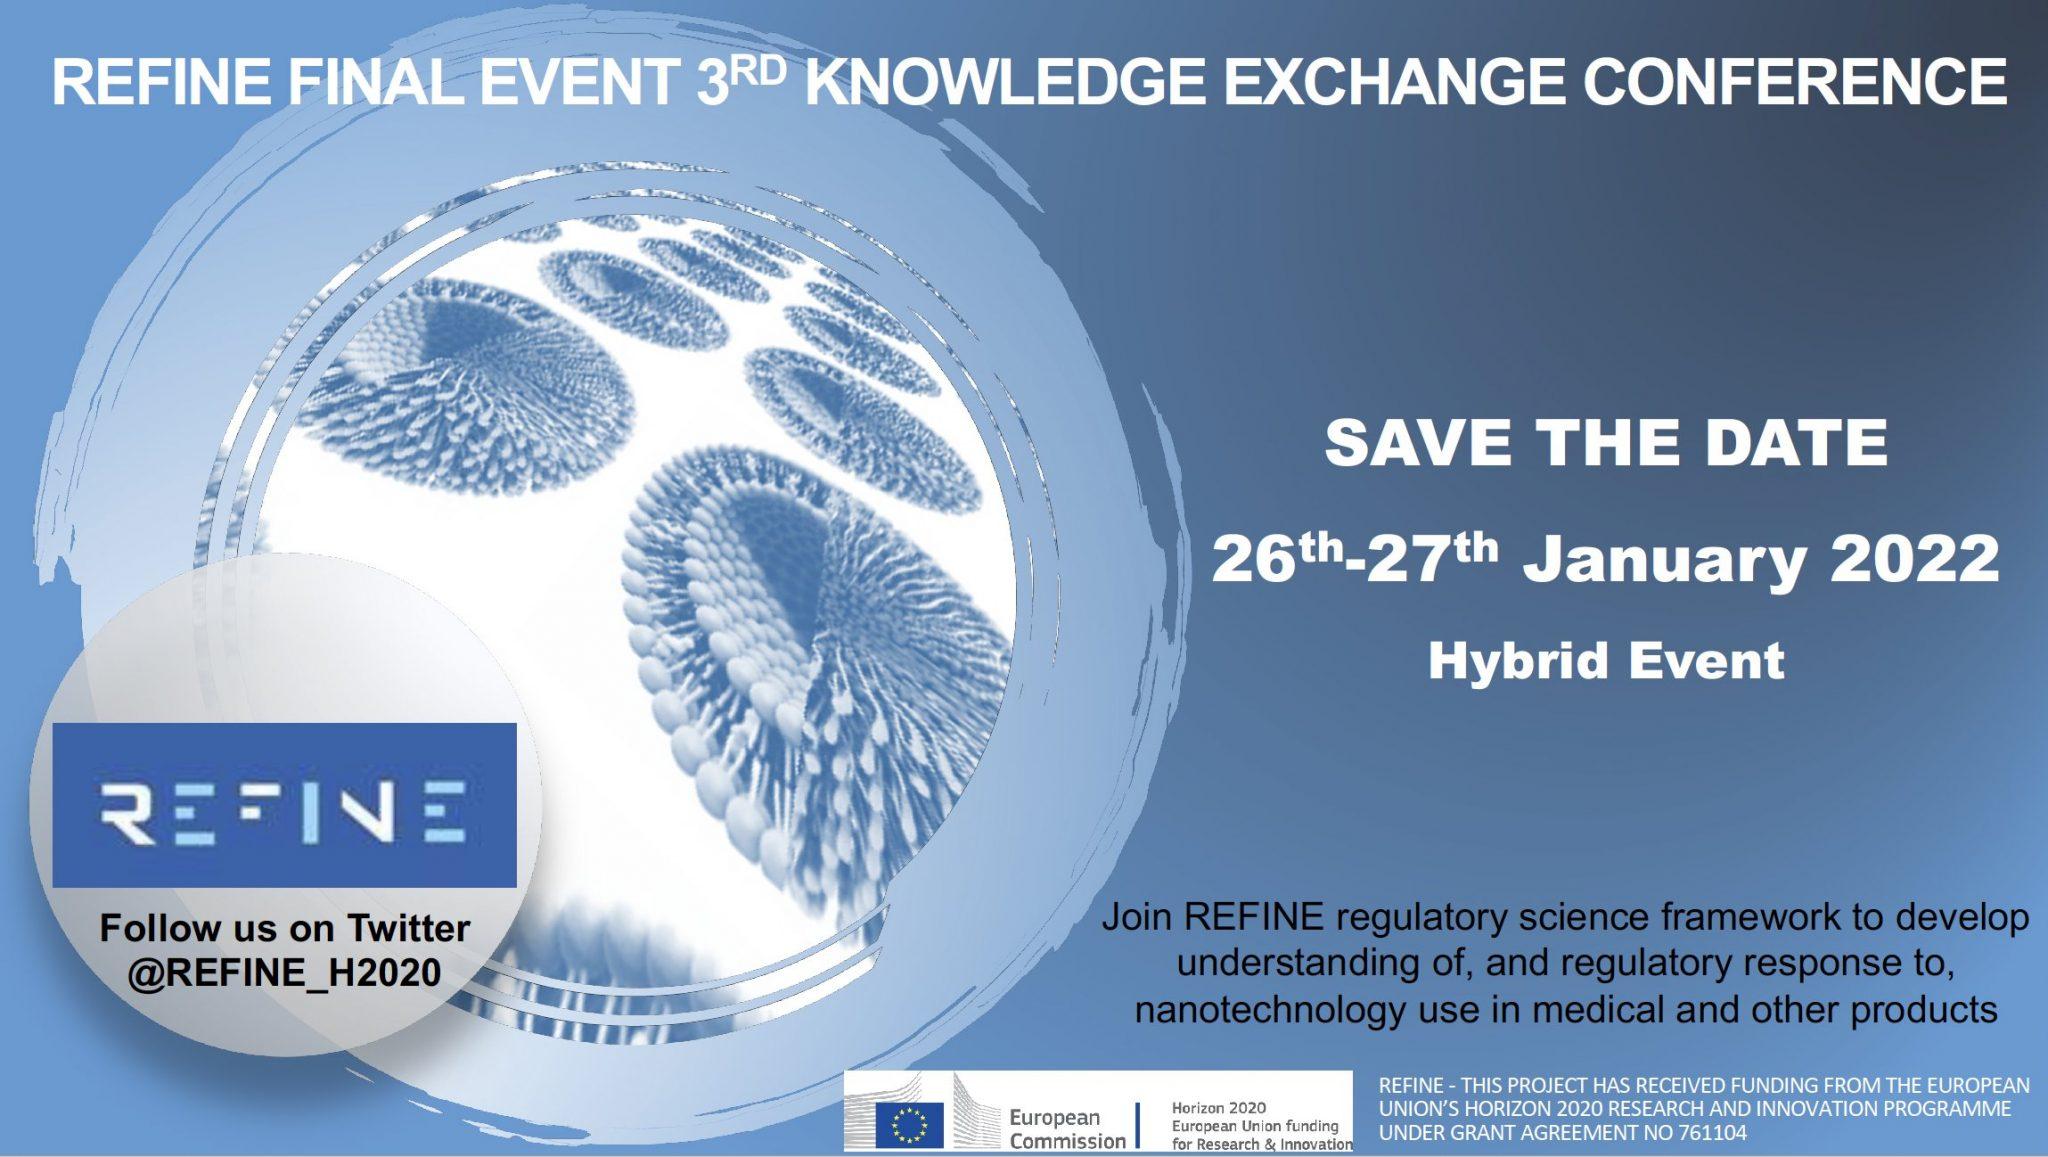 REFINE final Knowledge Exchange Conference / Regulatory Science Framework for Nanomedicine